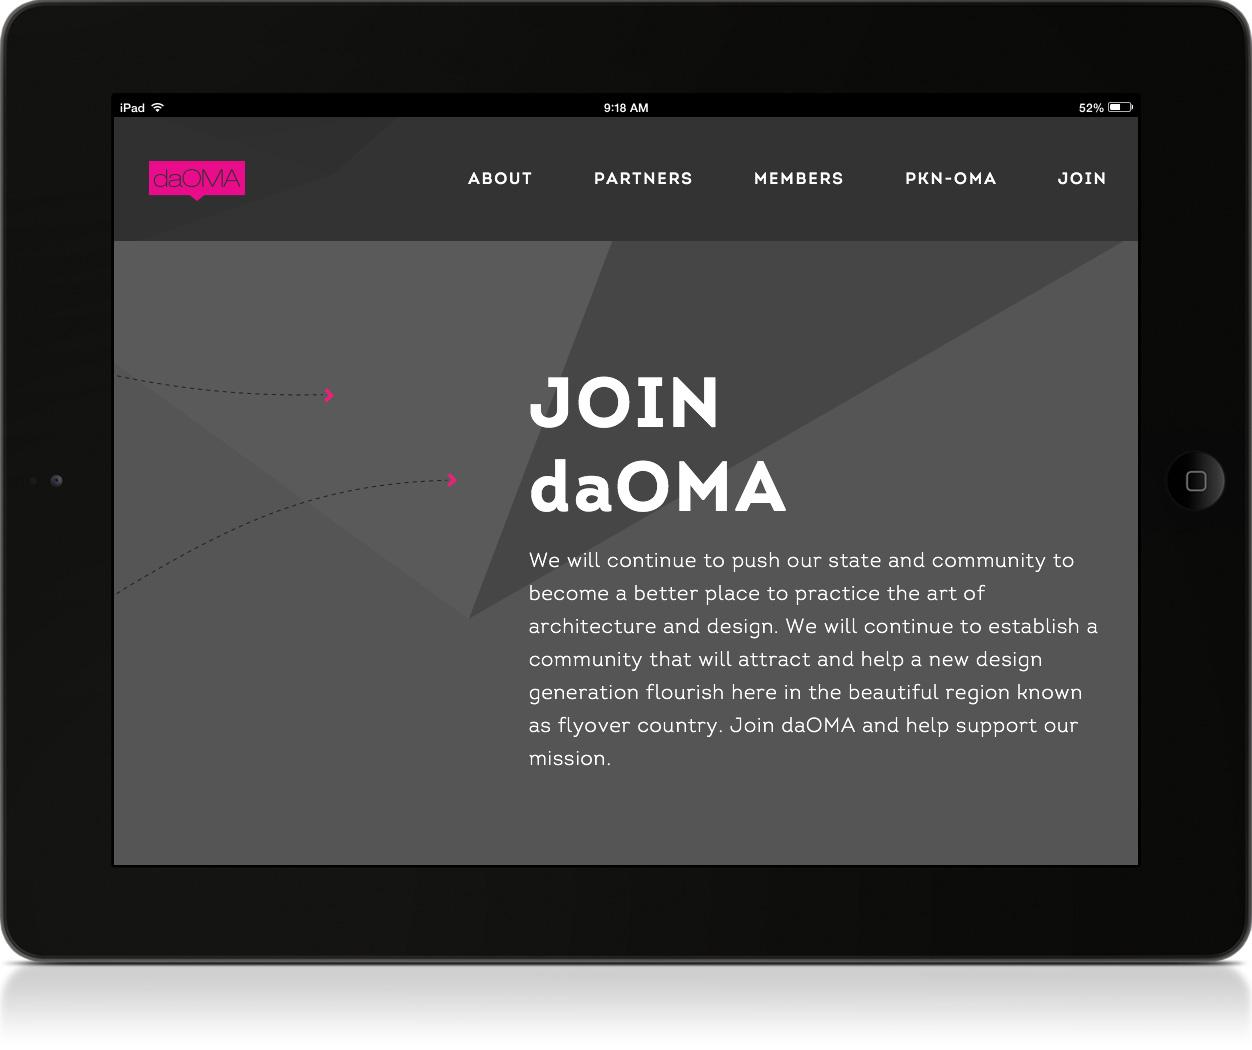 jkdc_daoma-site_ipad_join.jpg